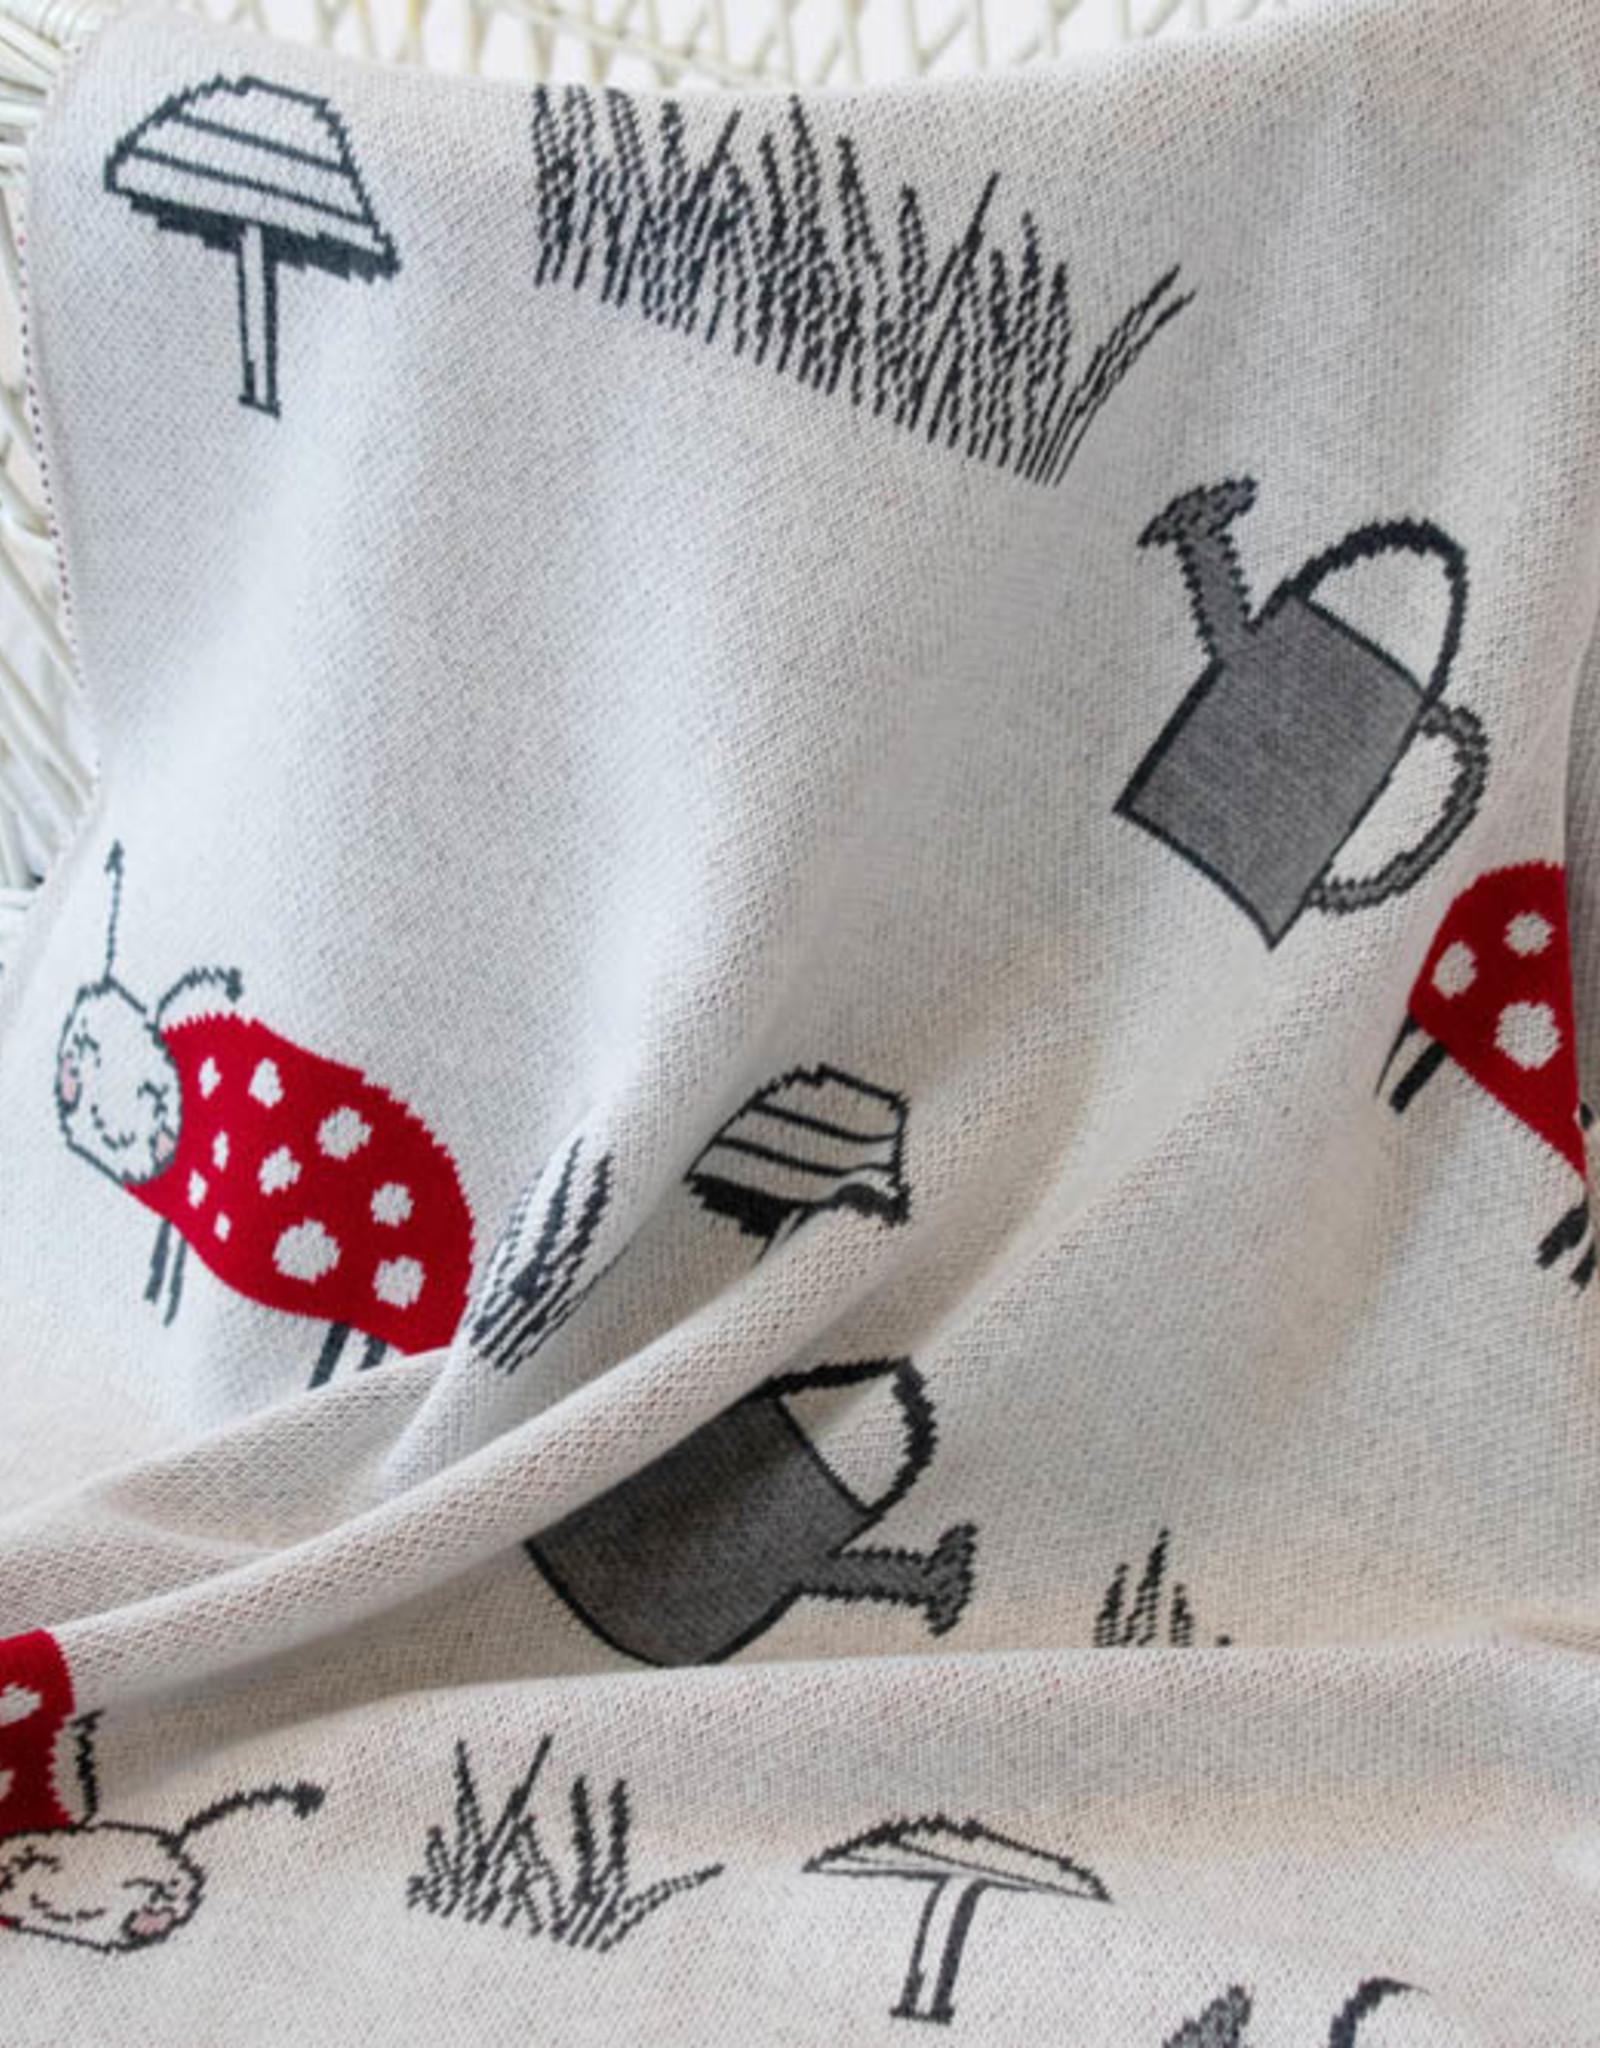 Indus Design Indus - Lily Ladybug Blanket